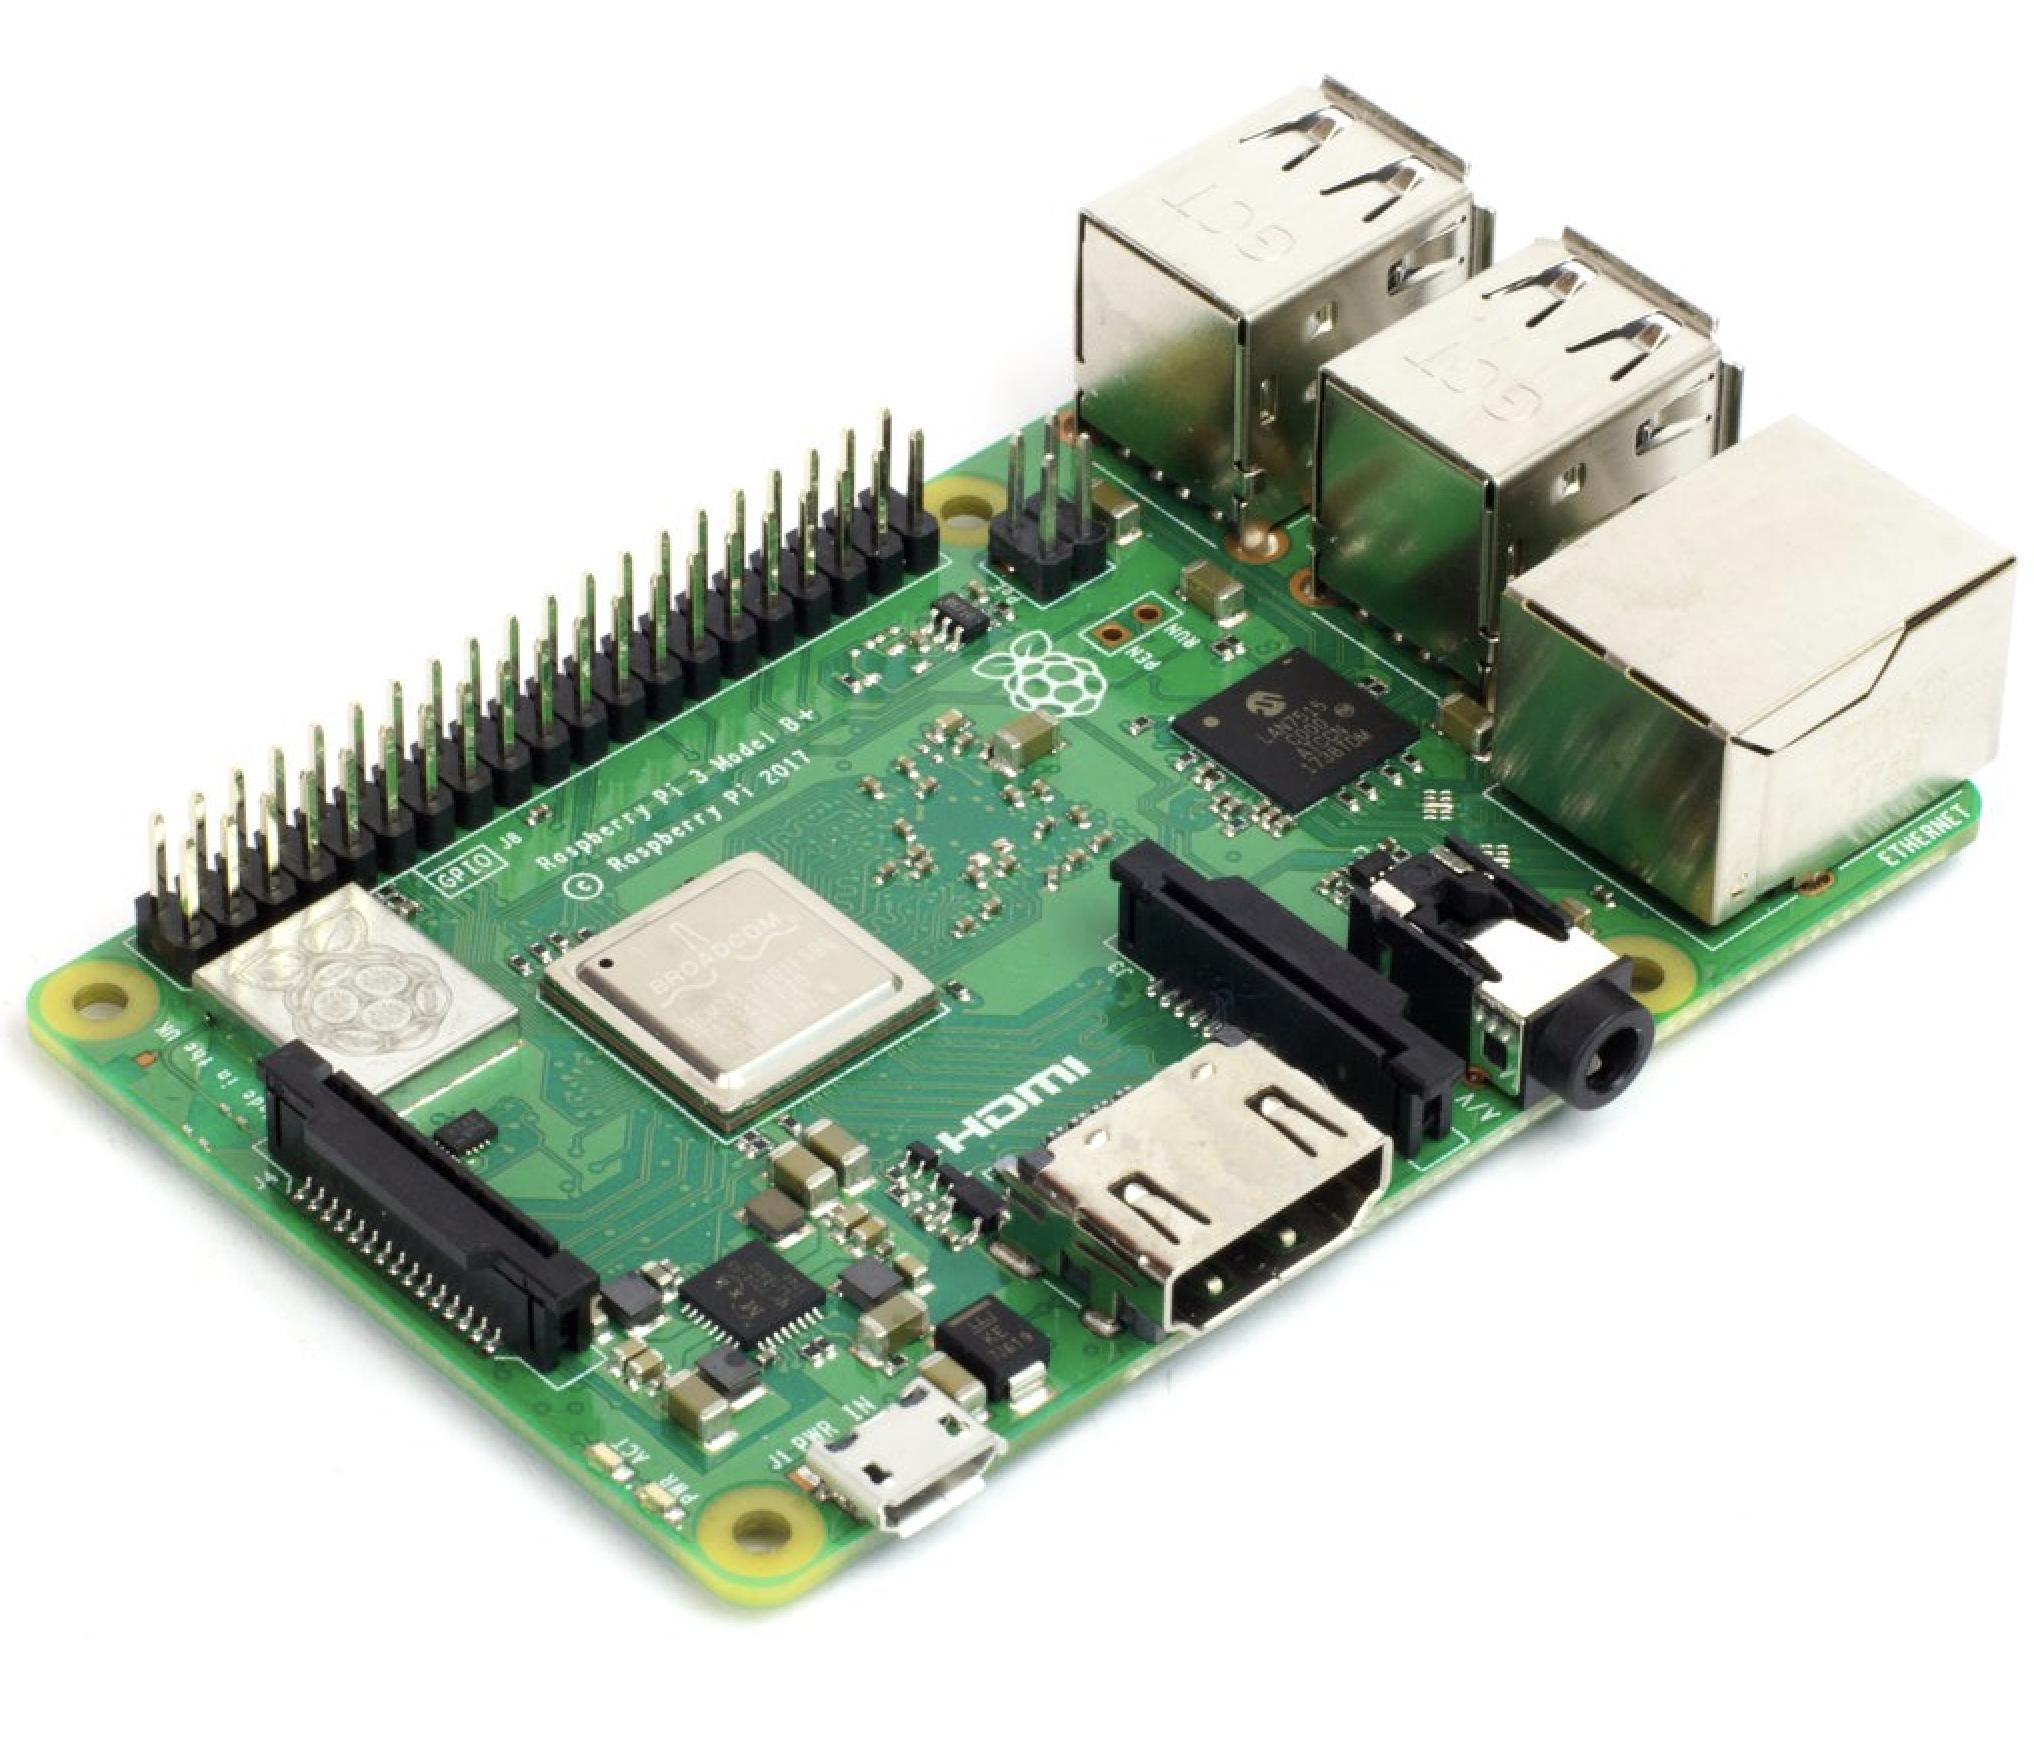 Raspberry Pi 3 Model B Bcm2837b0 Soc Iot Poe 64bit 14ghz Quad Hardware Circuit Of Pcbased Data Logger Is Designed Around Analog Core 1gb Ram Dual Band 80211 G N Ac 300mbit S Bt42 Rlx Components Sro